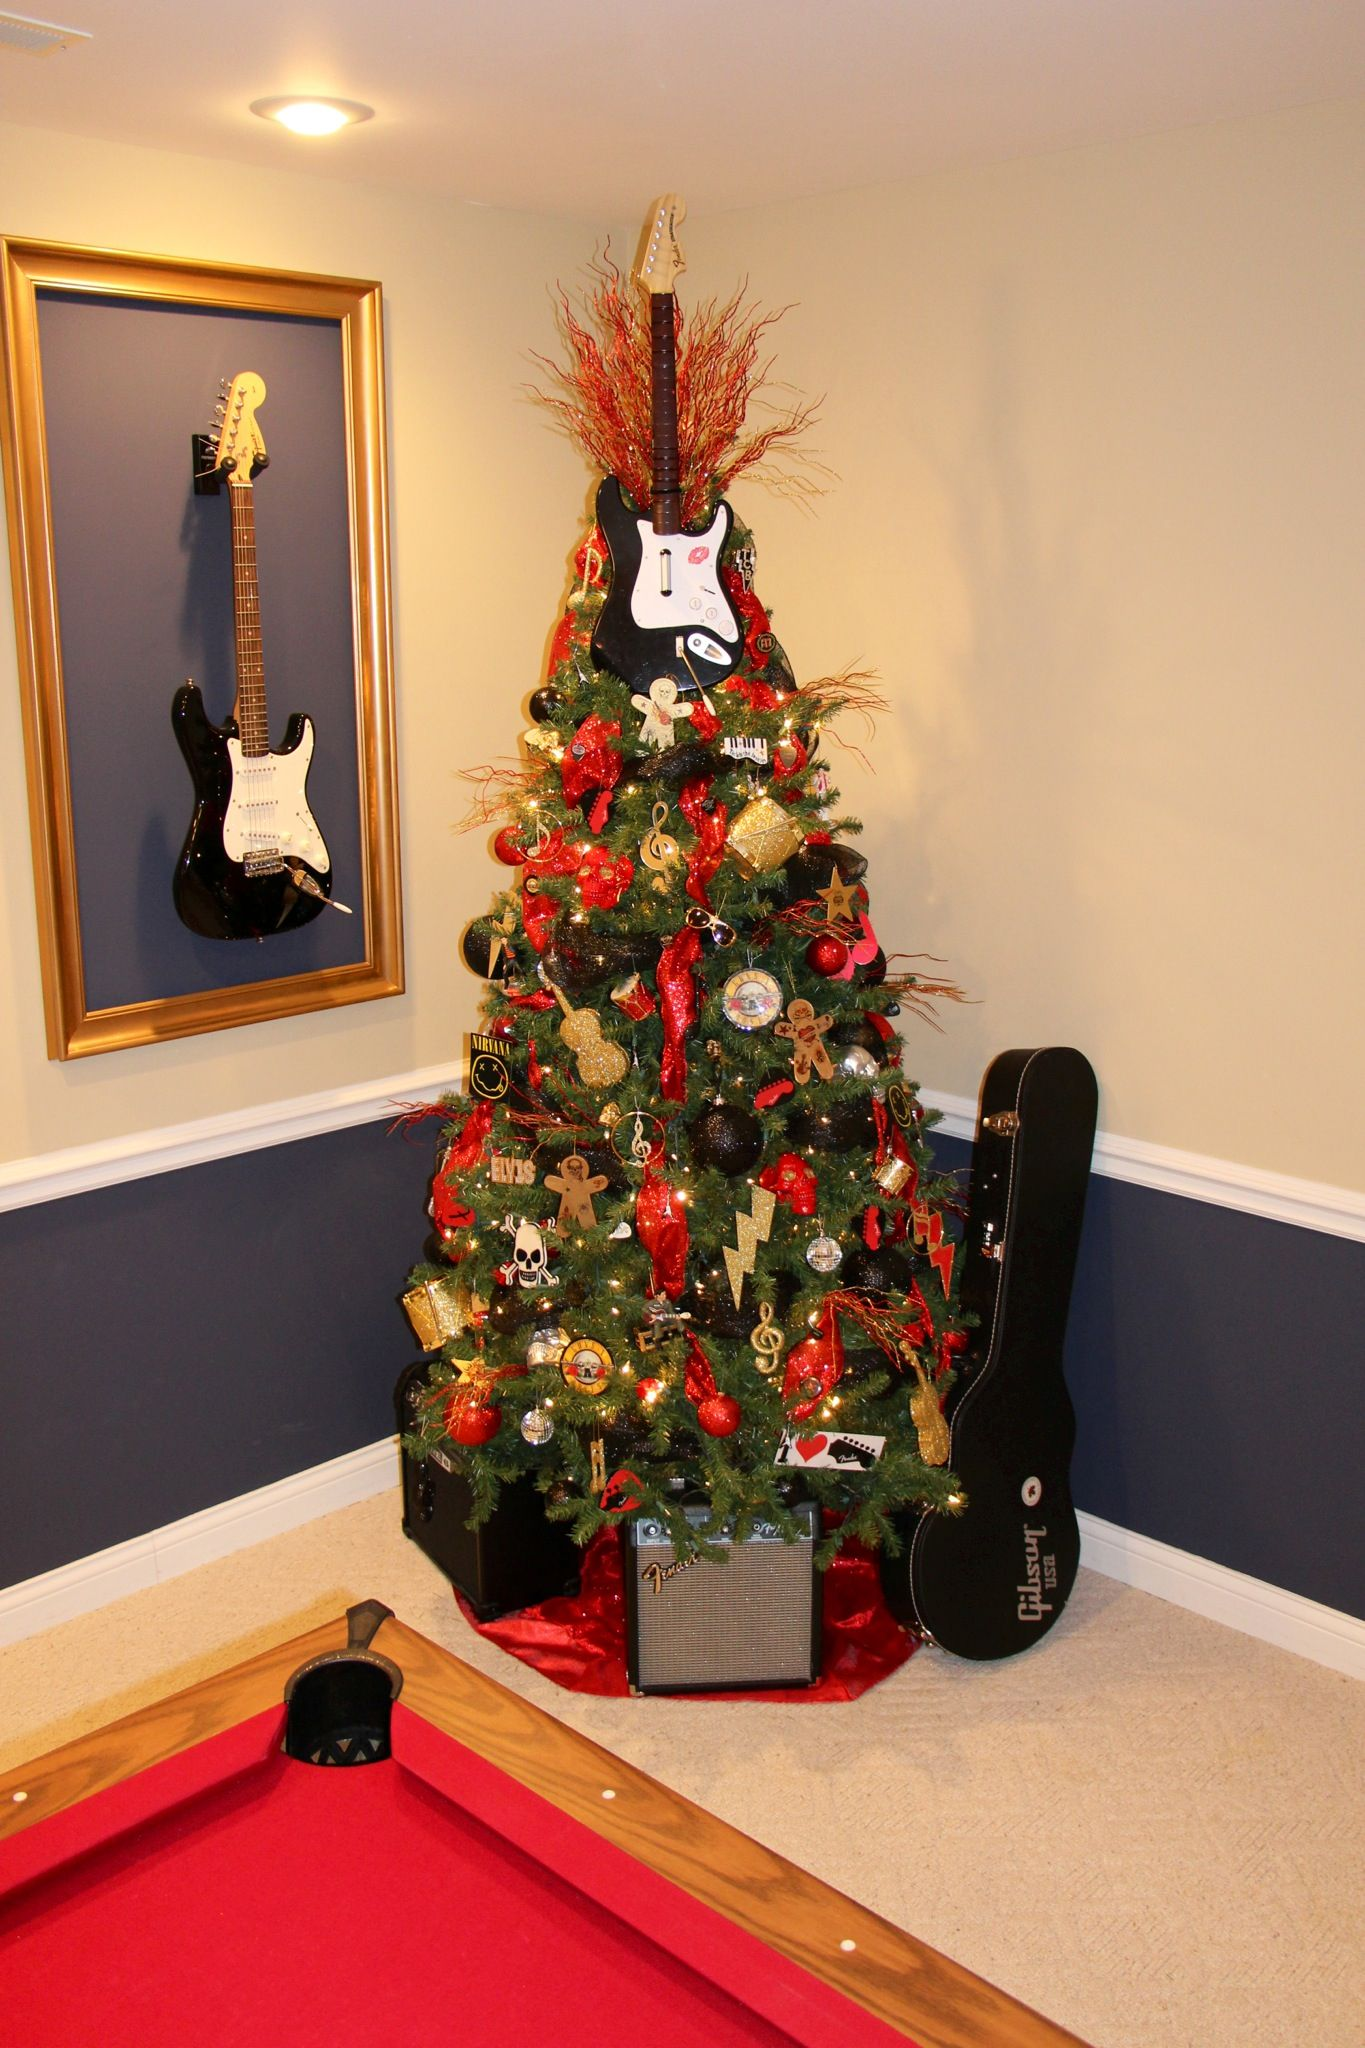 Superb Rock N Roll Christmas Tree Tatted Gingerbread Man, Fender, Guitar Picks,  Elvis,